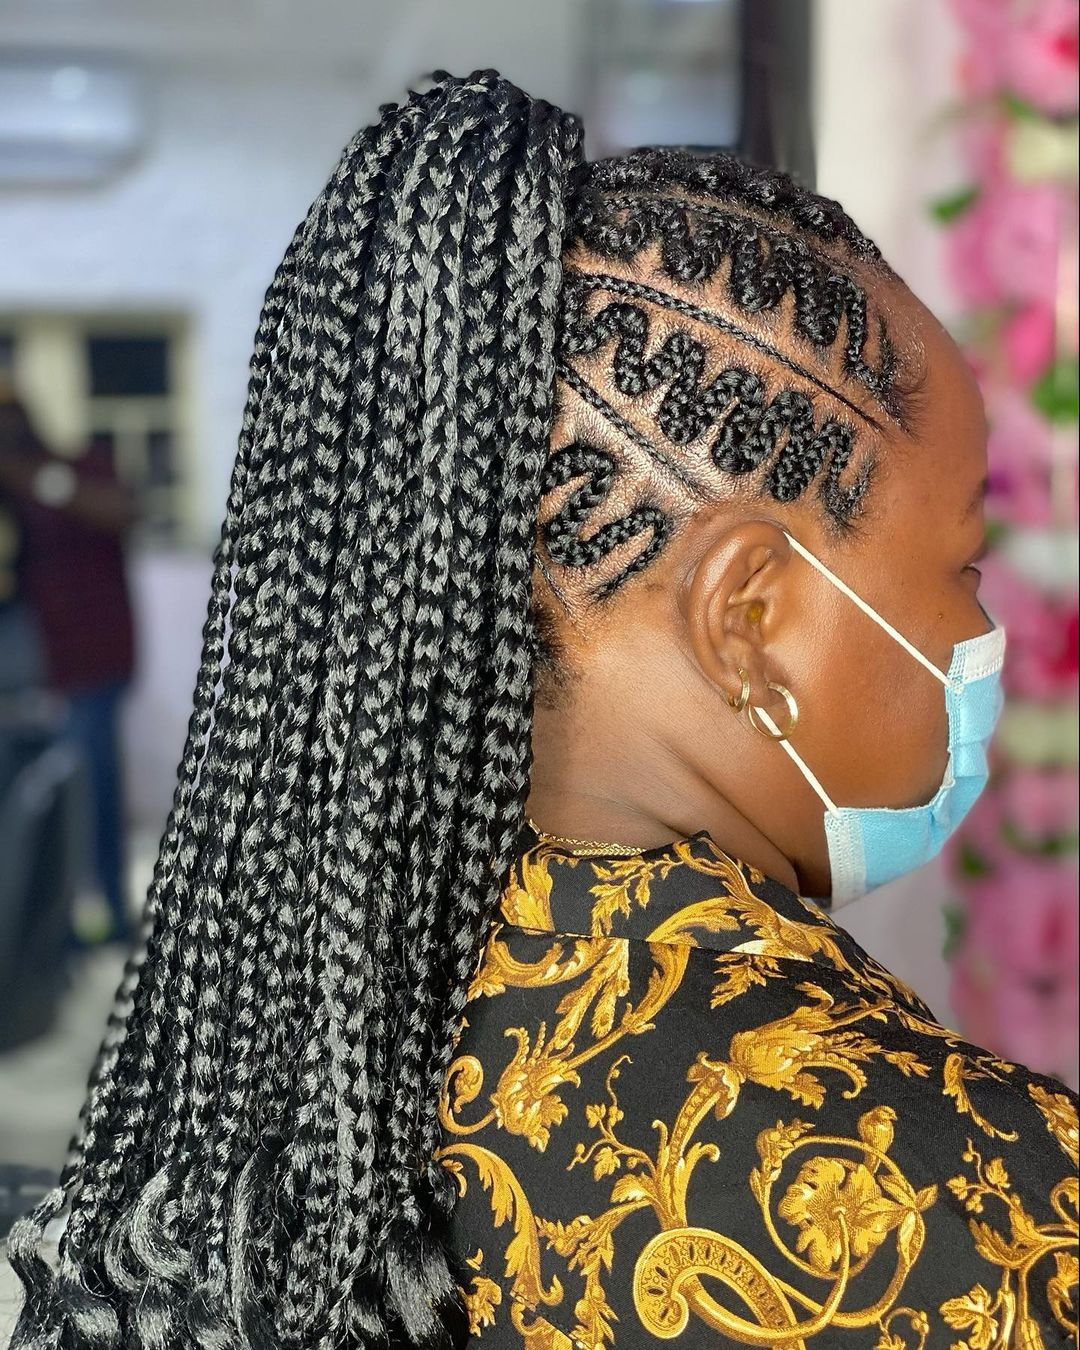 @infinity beautylounge LUXURY HAIR AND BEAUTY LOUNGE 2